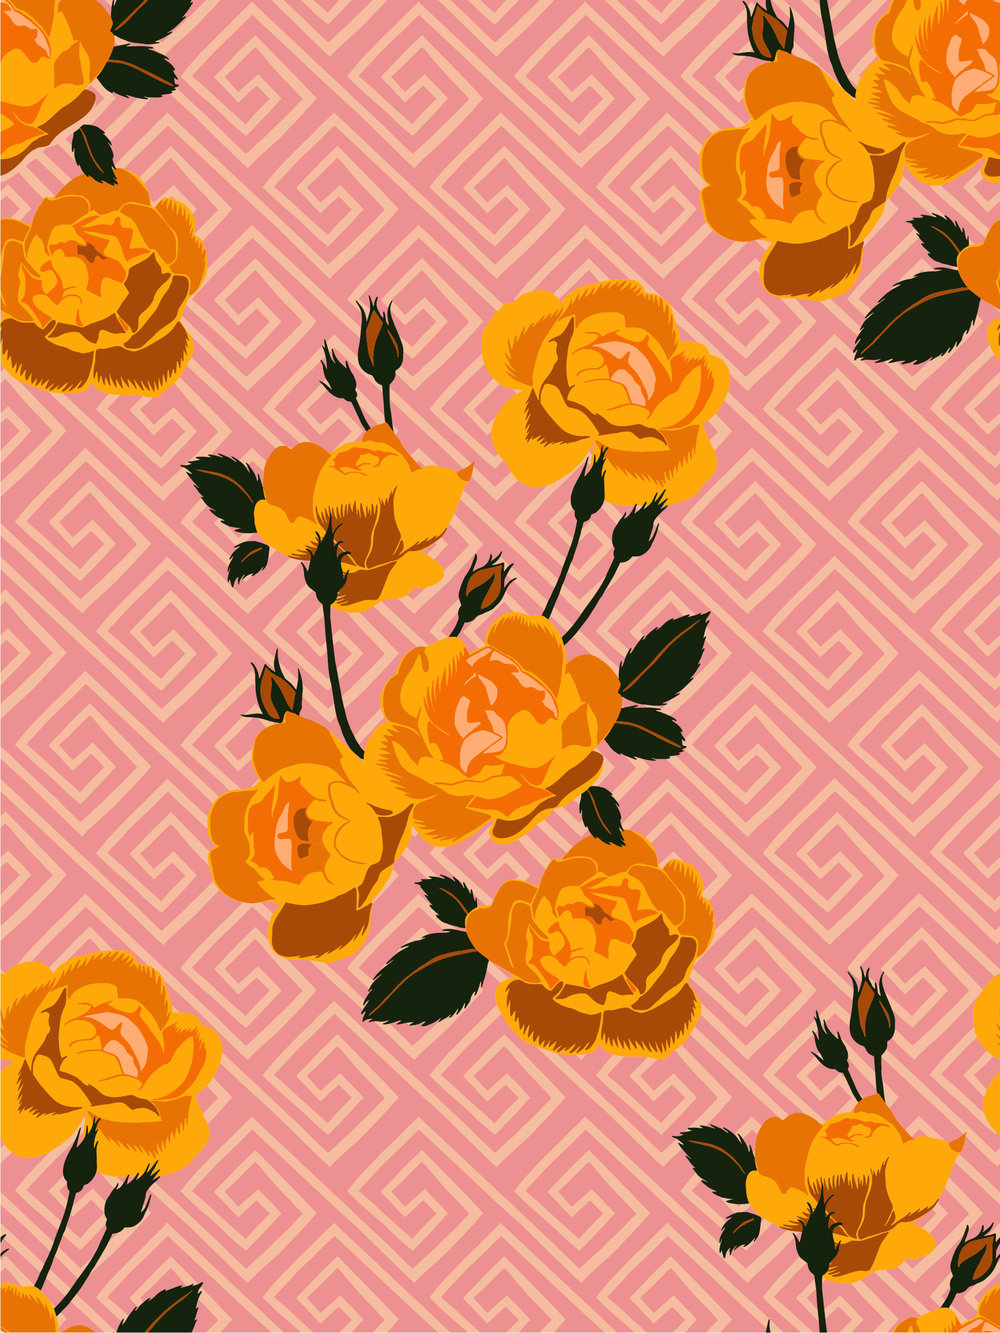 Kate Blairstone Greek Key & Roses